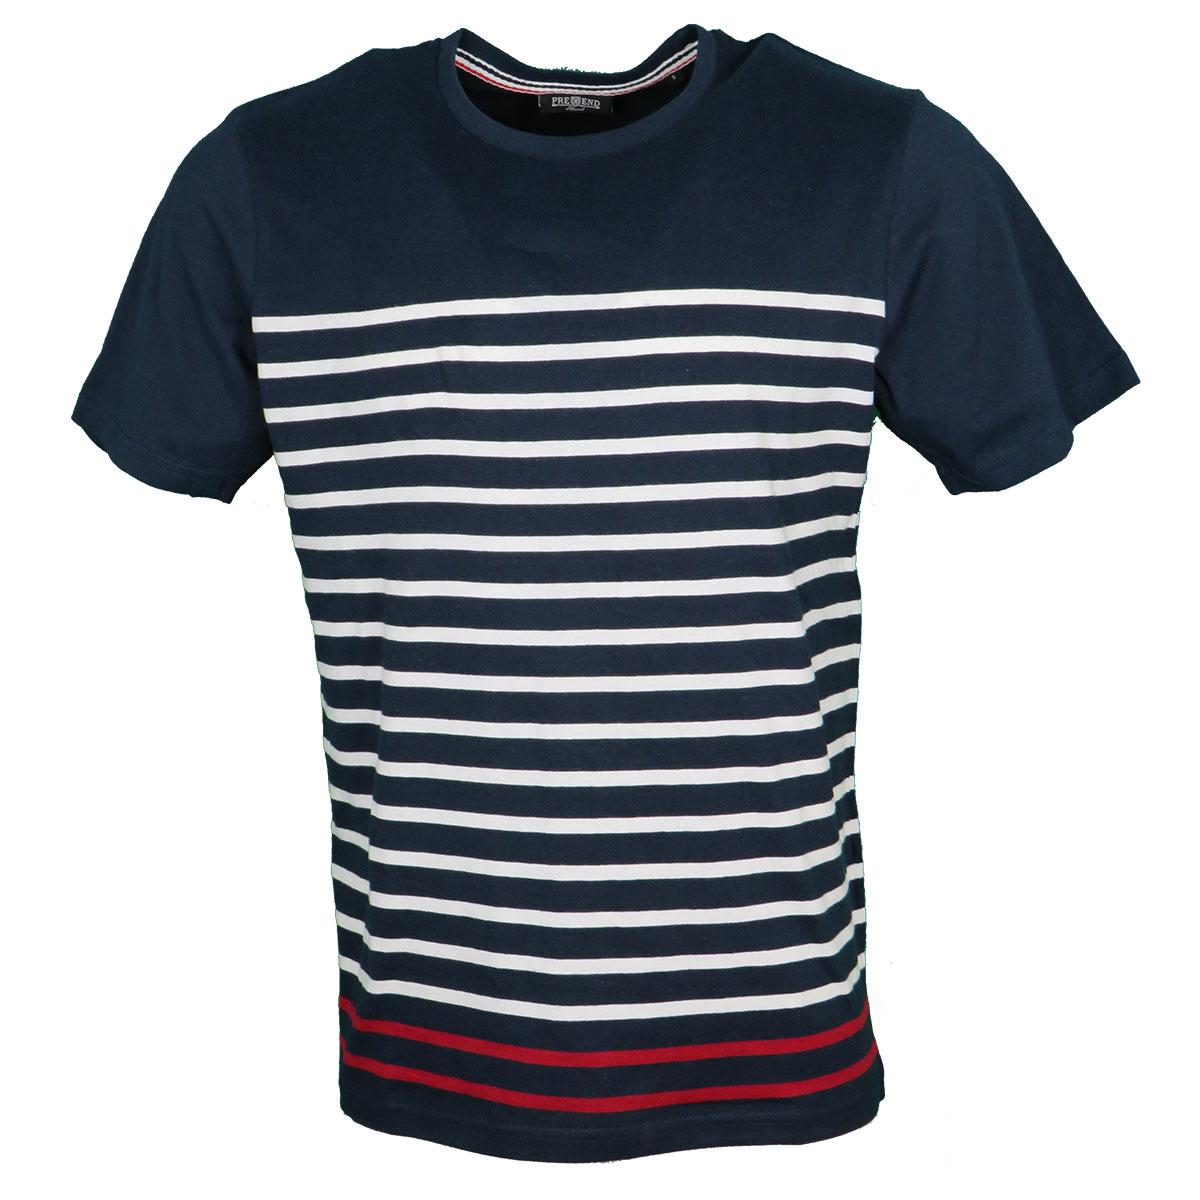 82d0740b15e Pre End 28-100243 Ανδρικό Μπλουζάκι Μπλέ 7050 - Privato